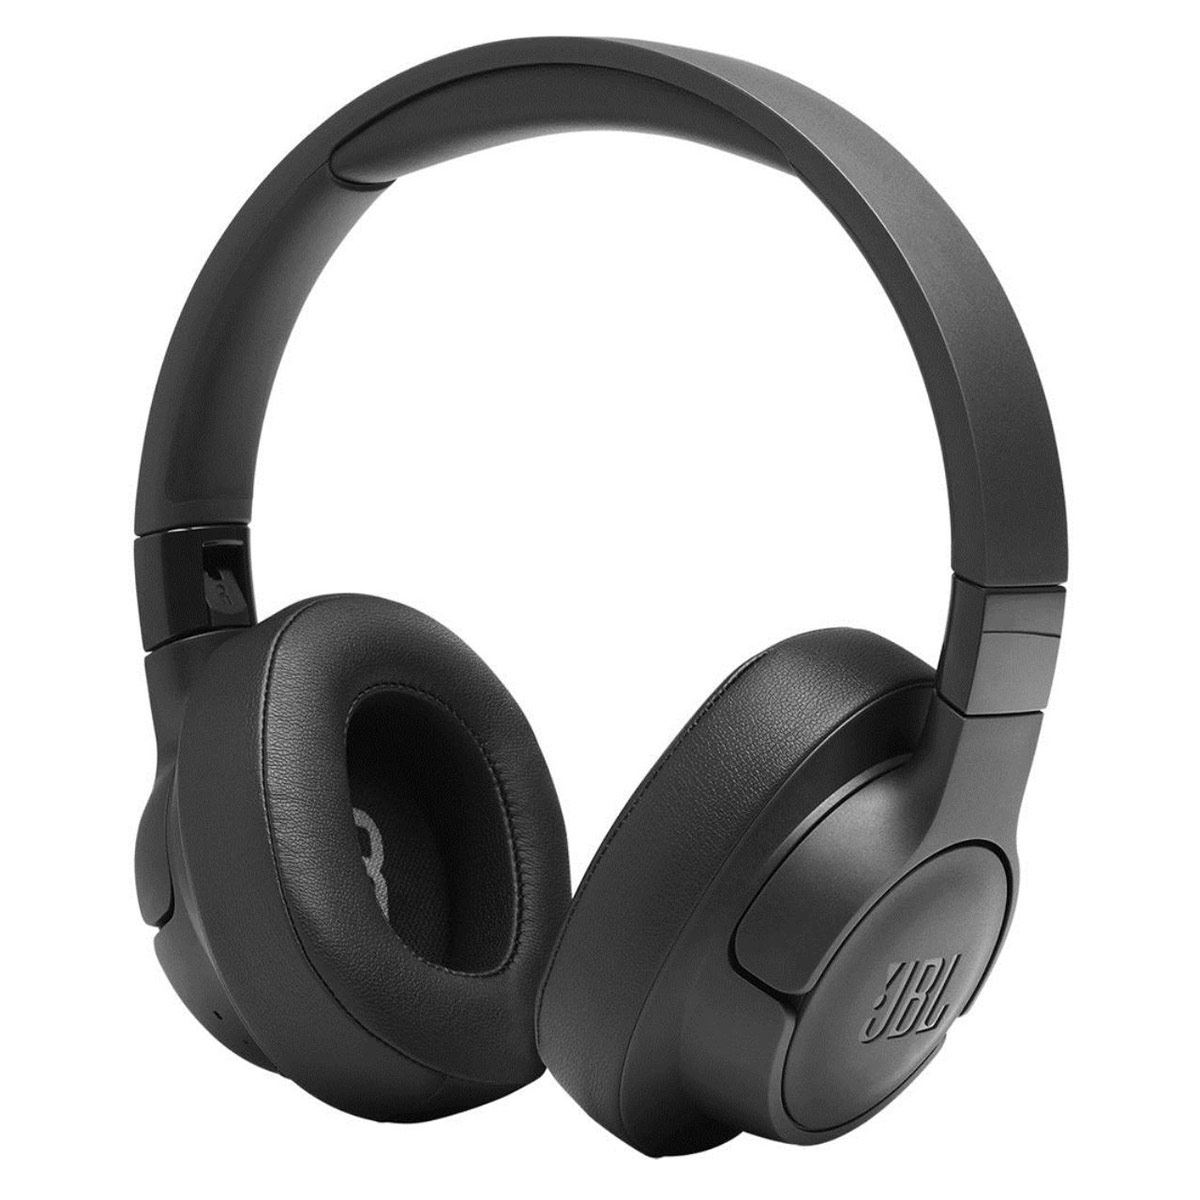 Audífonos JBL Tune 700 Bluetooth Negro